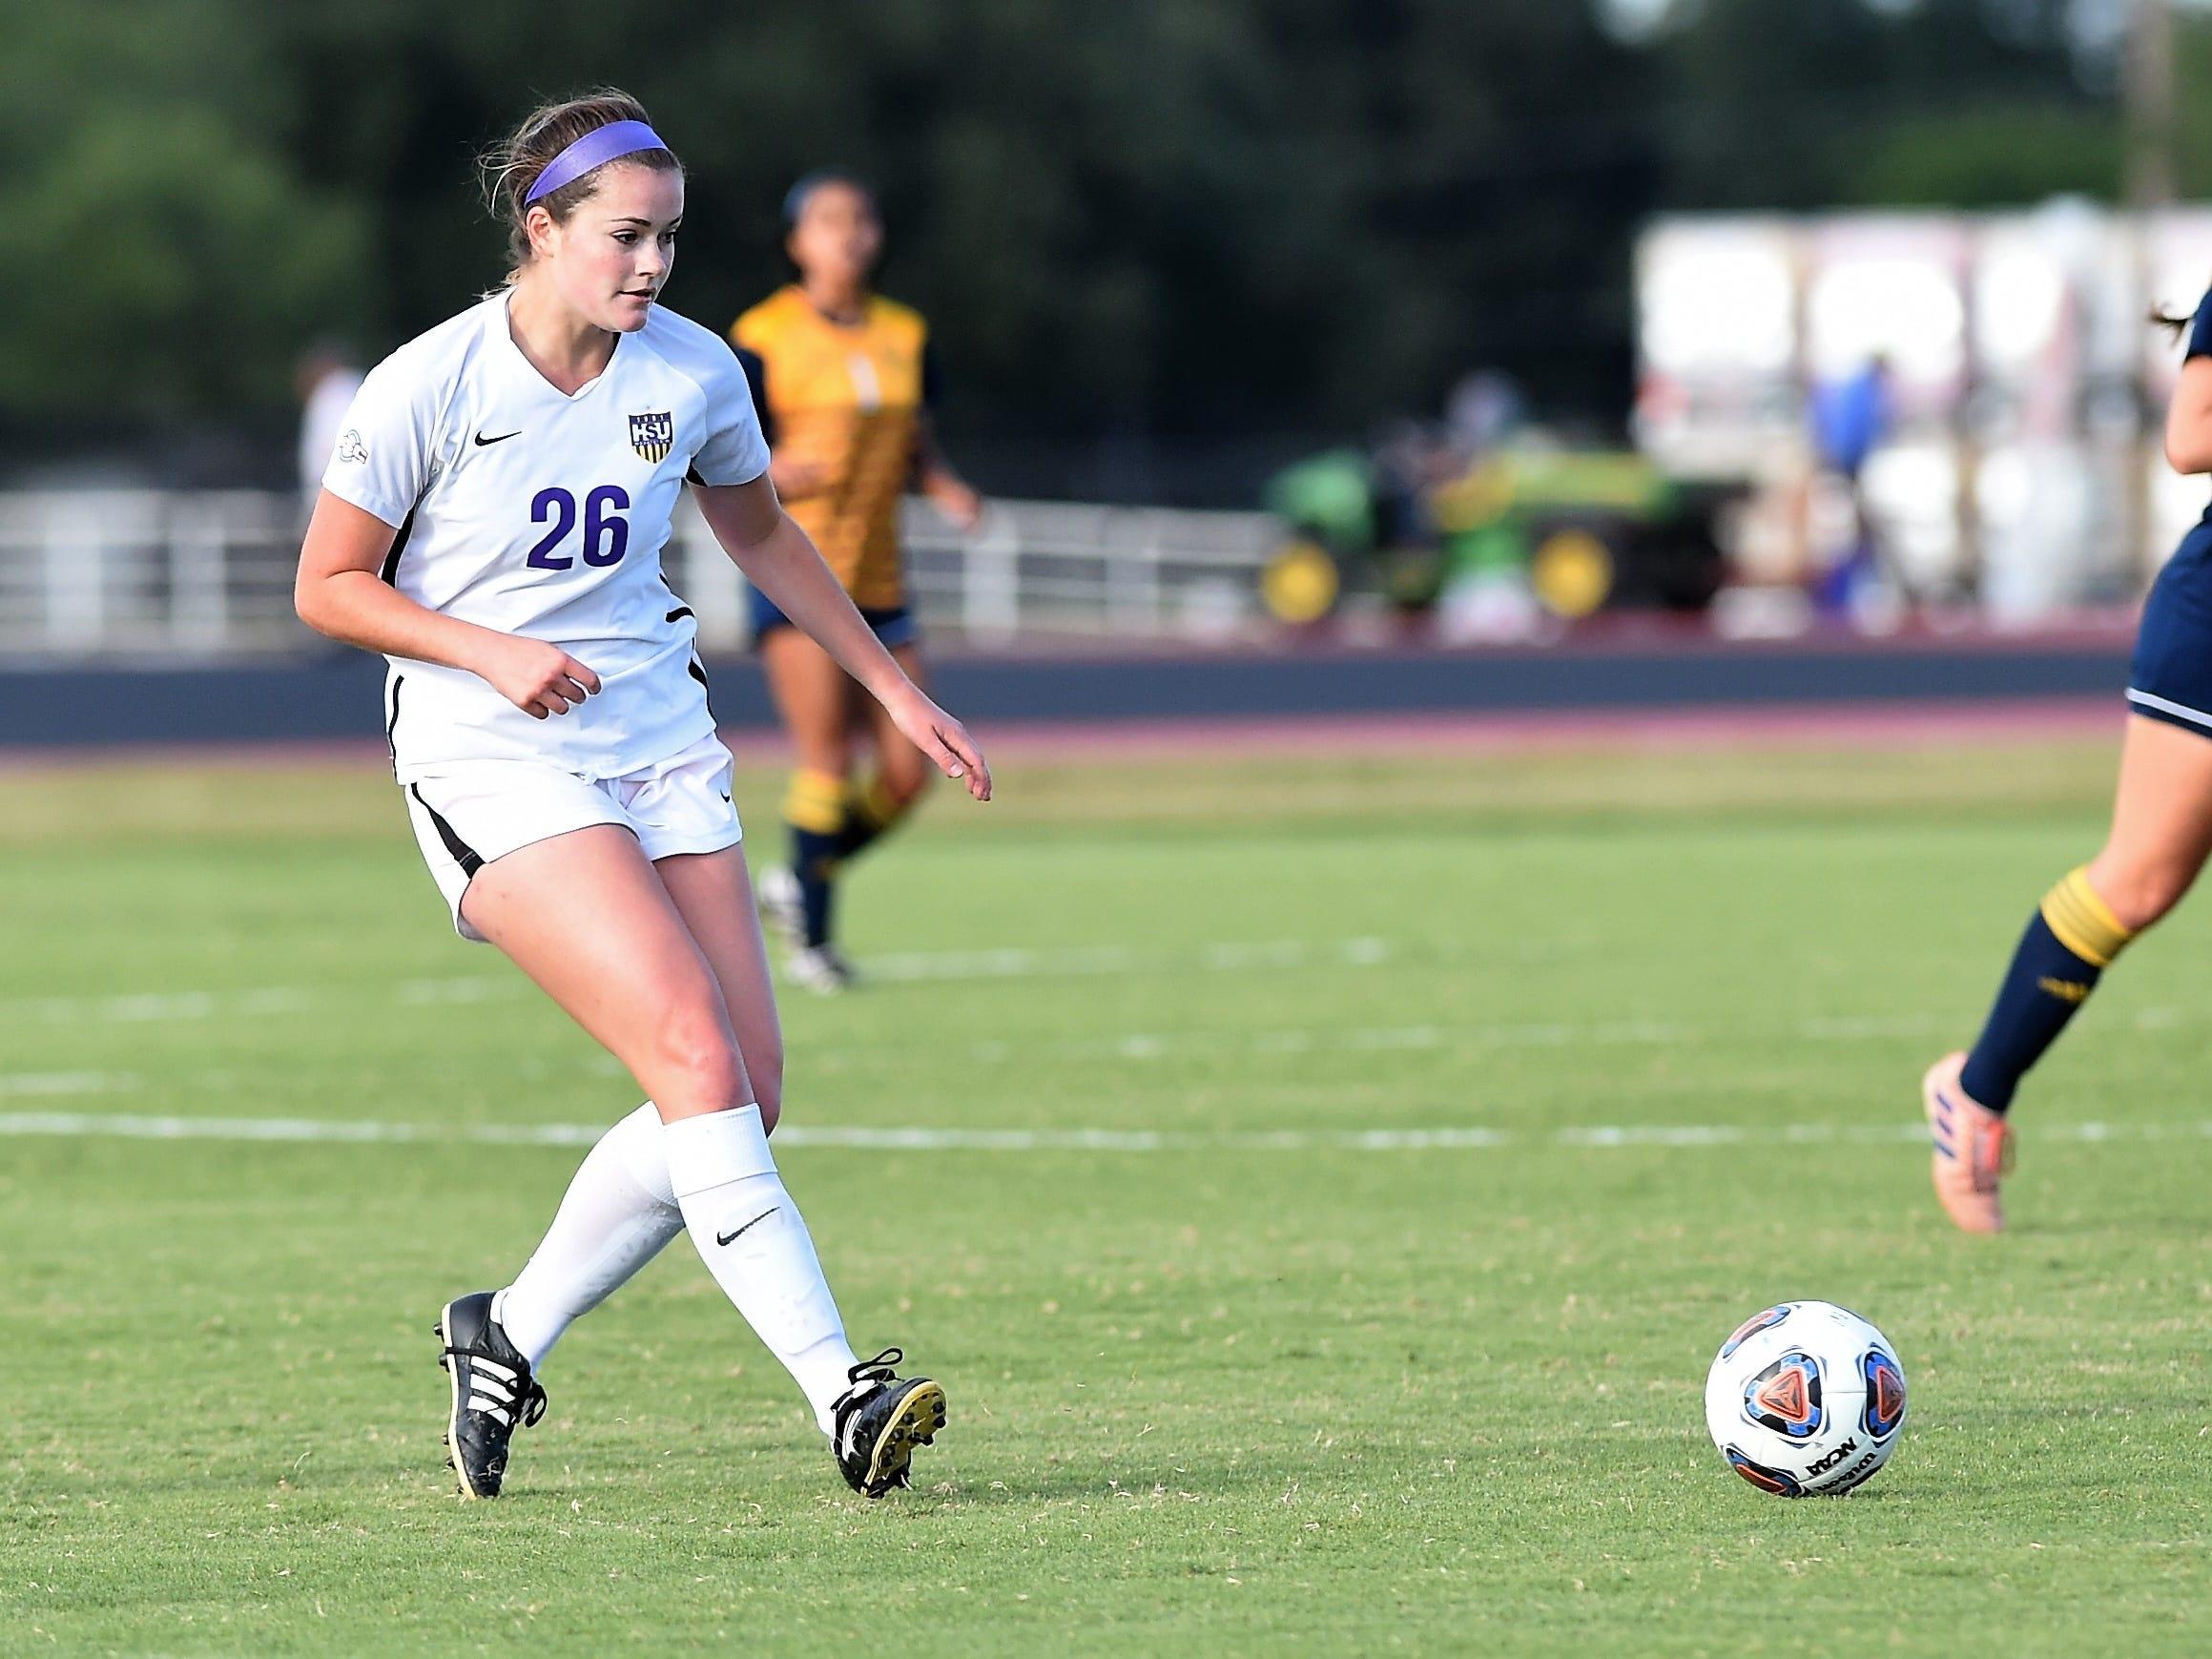 Hardin-Simmons midfielder Rachel bean (26) makes a pass against Howard Payne at the HSU Soccer Complex on Thursday, Oct. 11, 2018. The Cowgirls won 4-1.